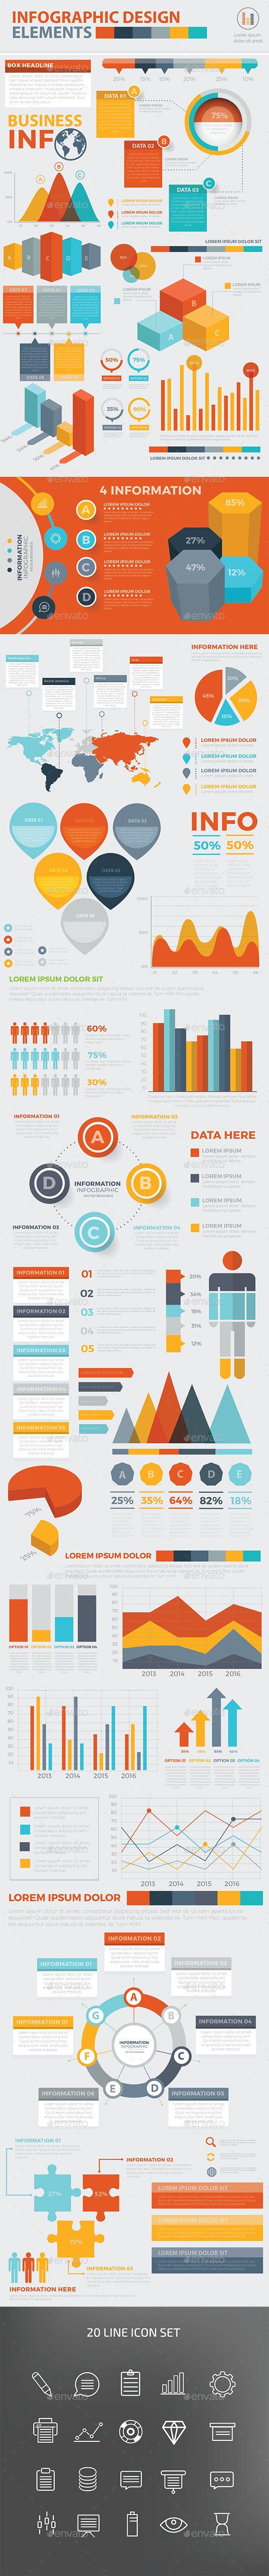 Modern Infographic Elements Design Template Vector EPS, AI Illustrator. Download here: http://graphicriver.net/item/modern-infographic-elements-design/16082166?ref=ksioks